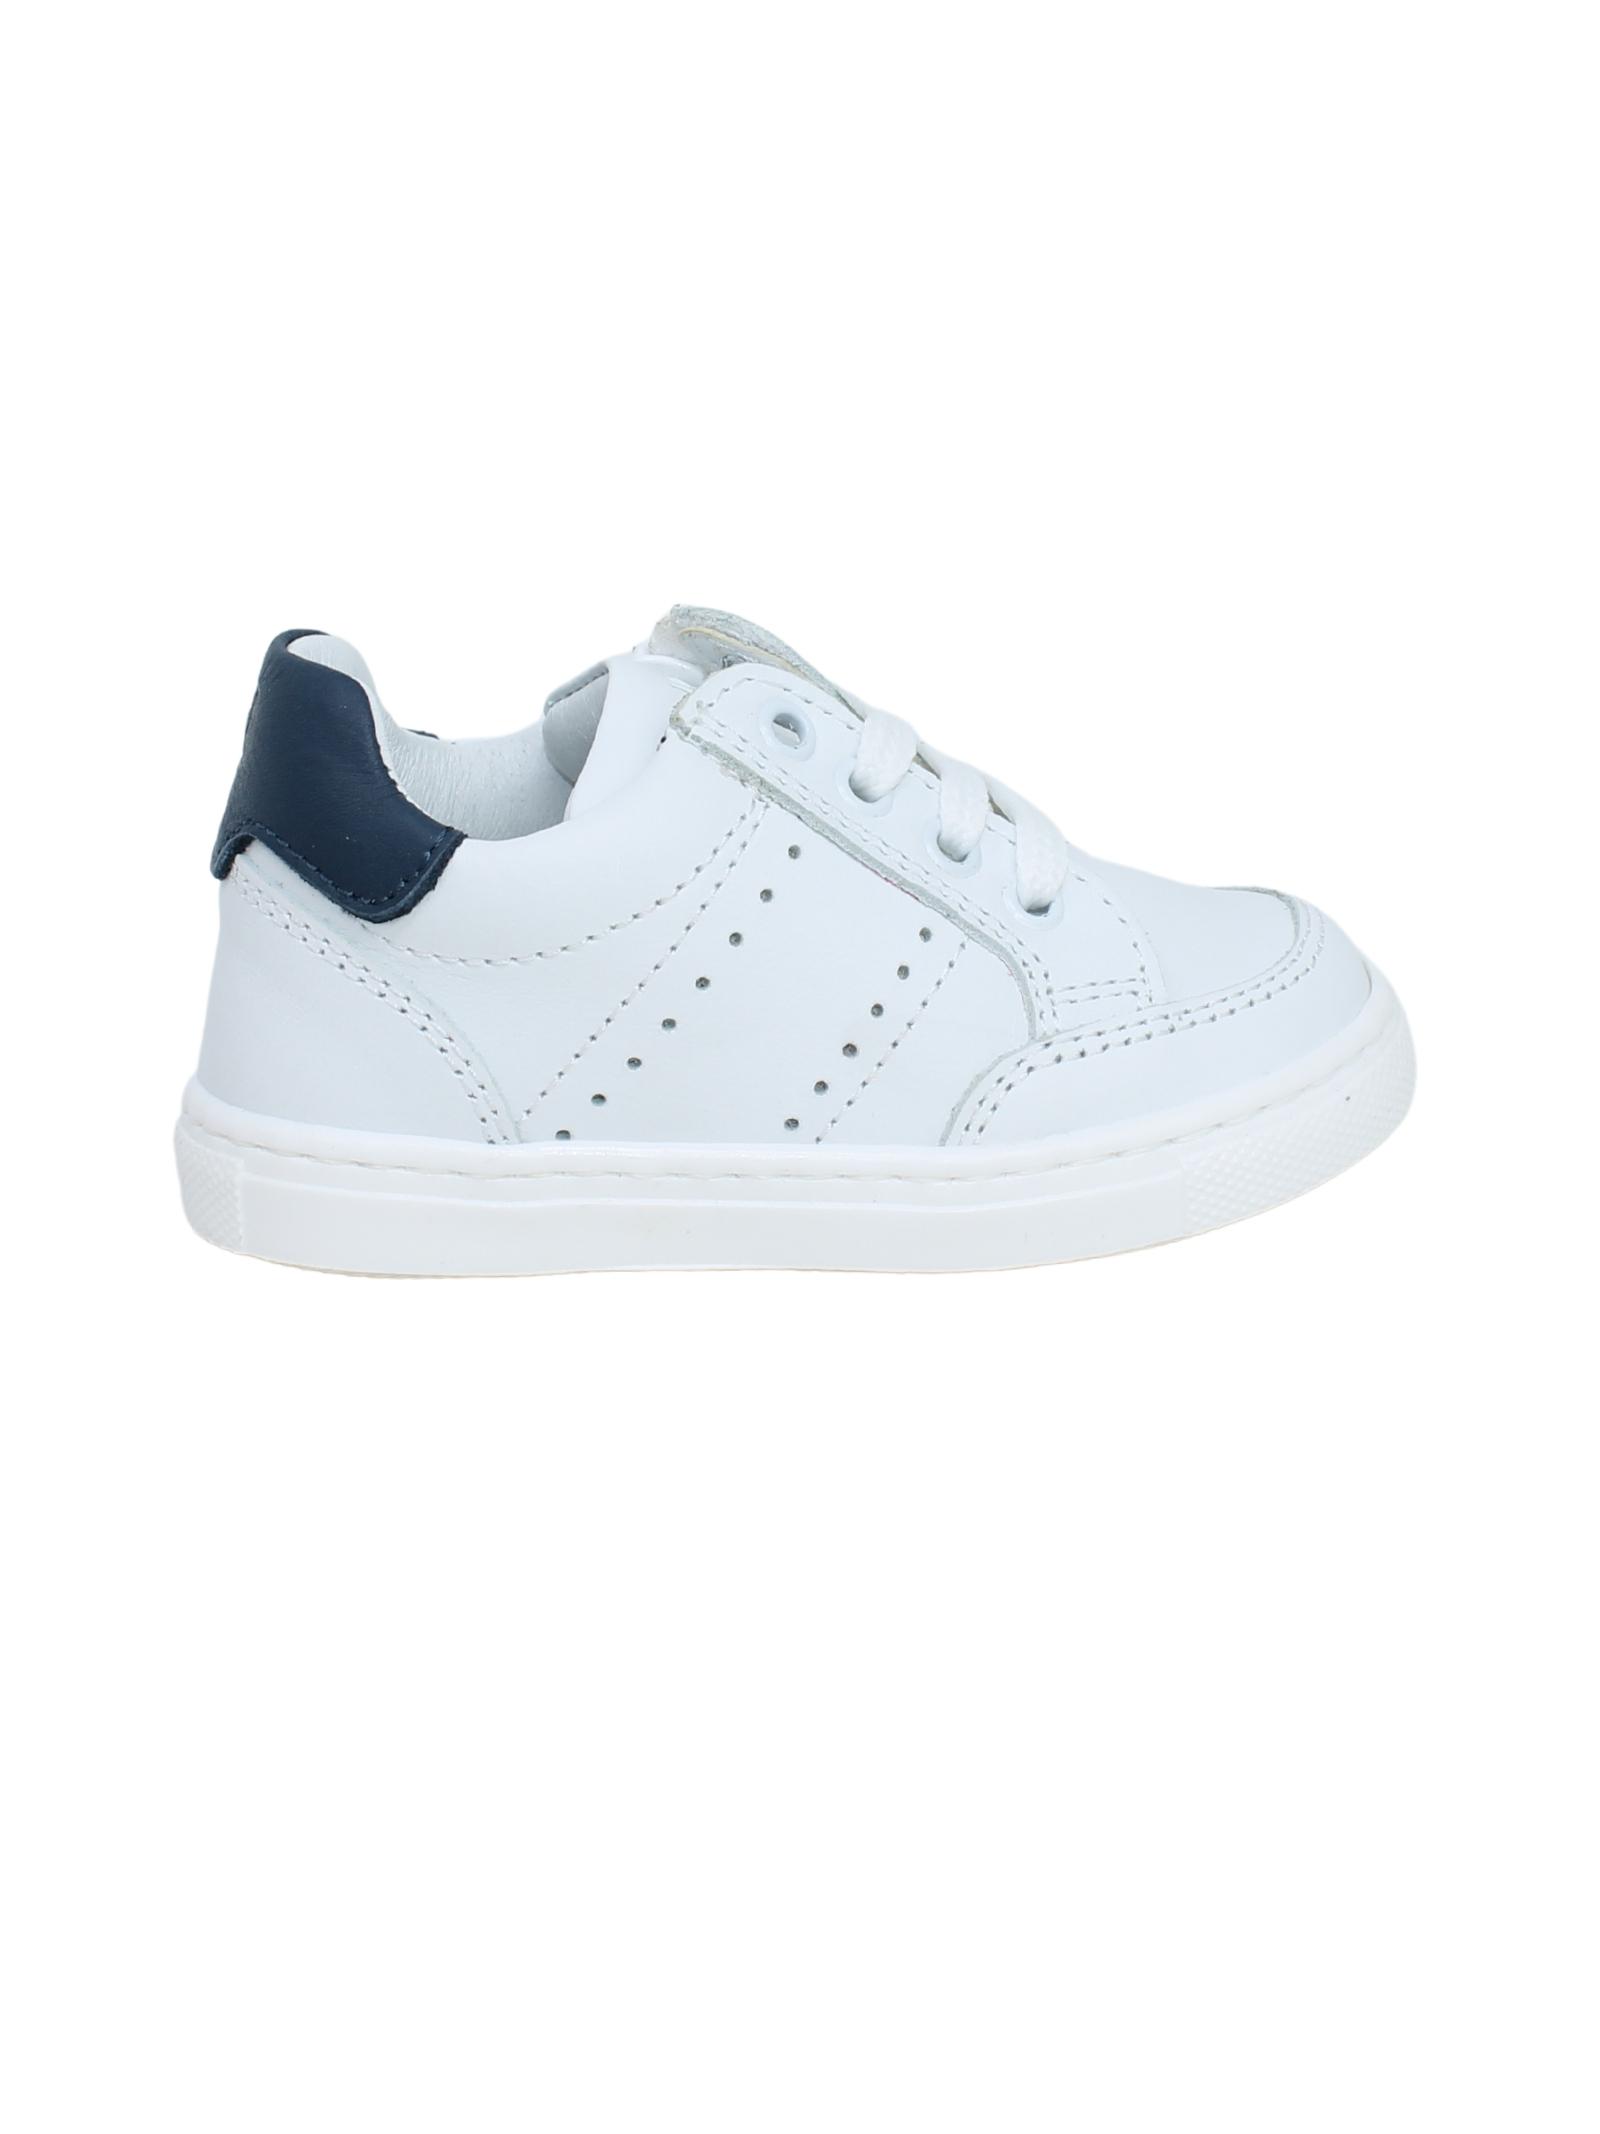 WALKEY | Sneakers | Y1B4406250092X336BIANCO/BLU